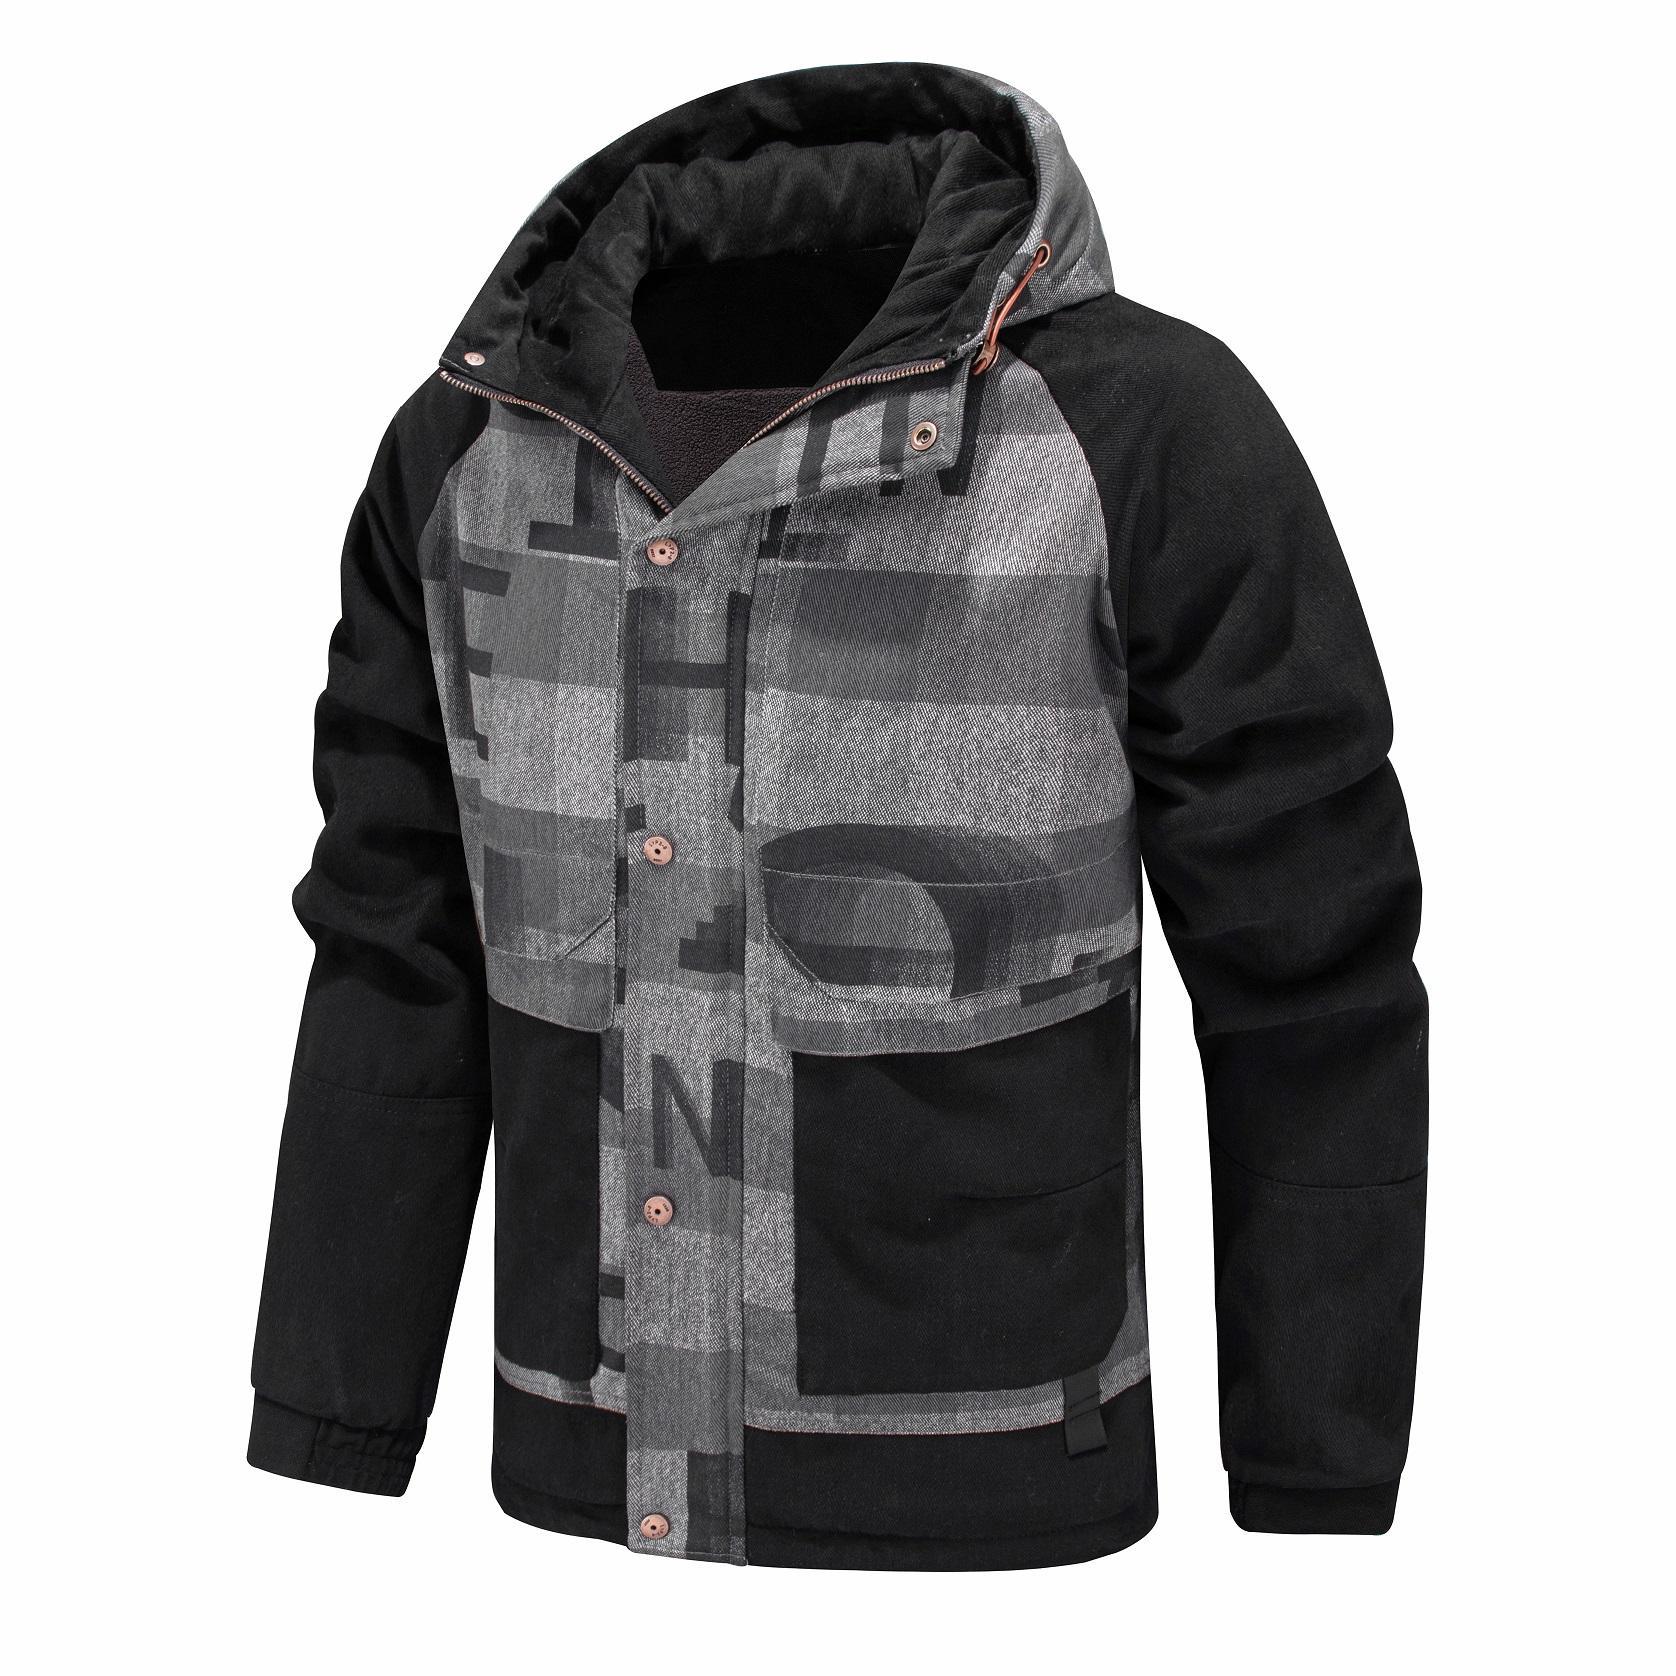 Bomber Jacket Euro Size Fashion OEM Custom Service Outdoor Fleece inside Windproof Design Custom Jaqueta Chaqueta Jacket